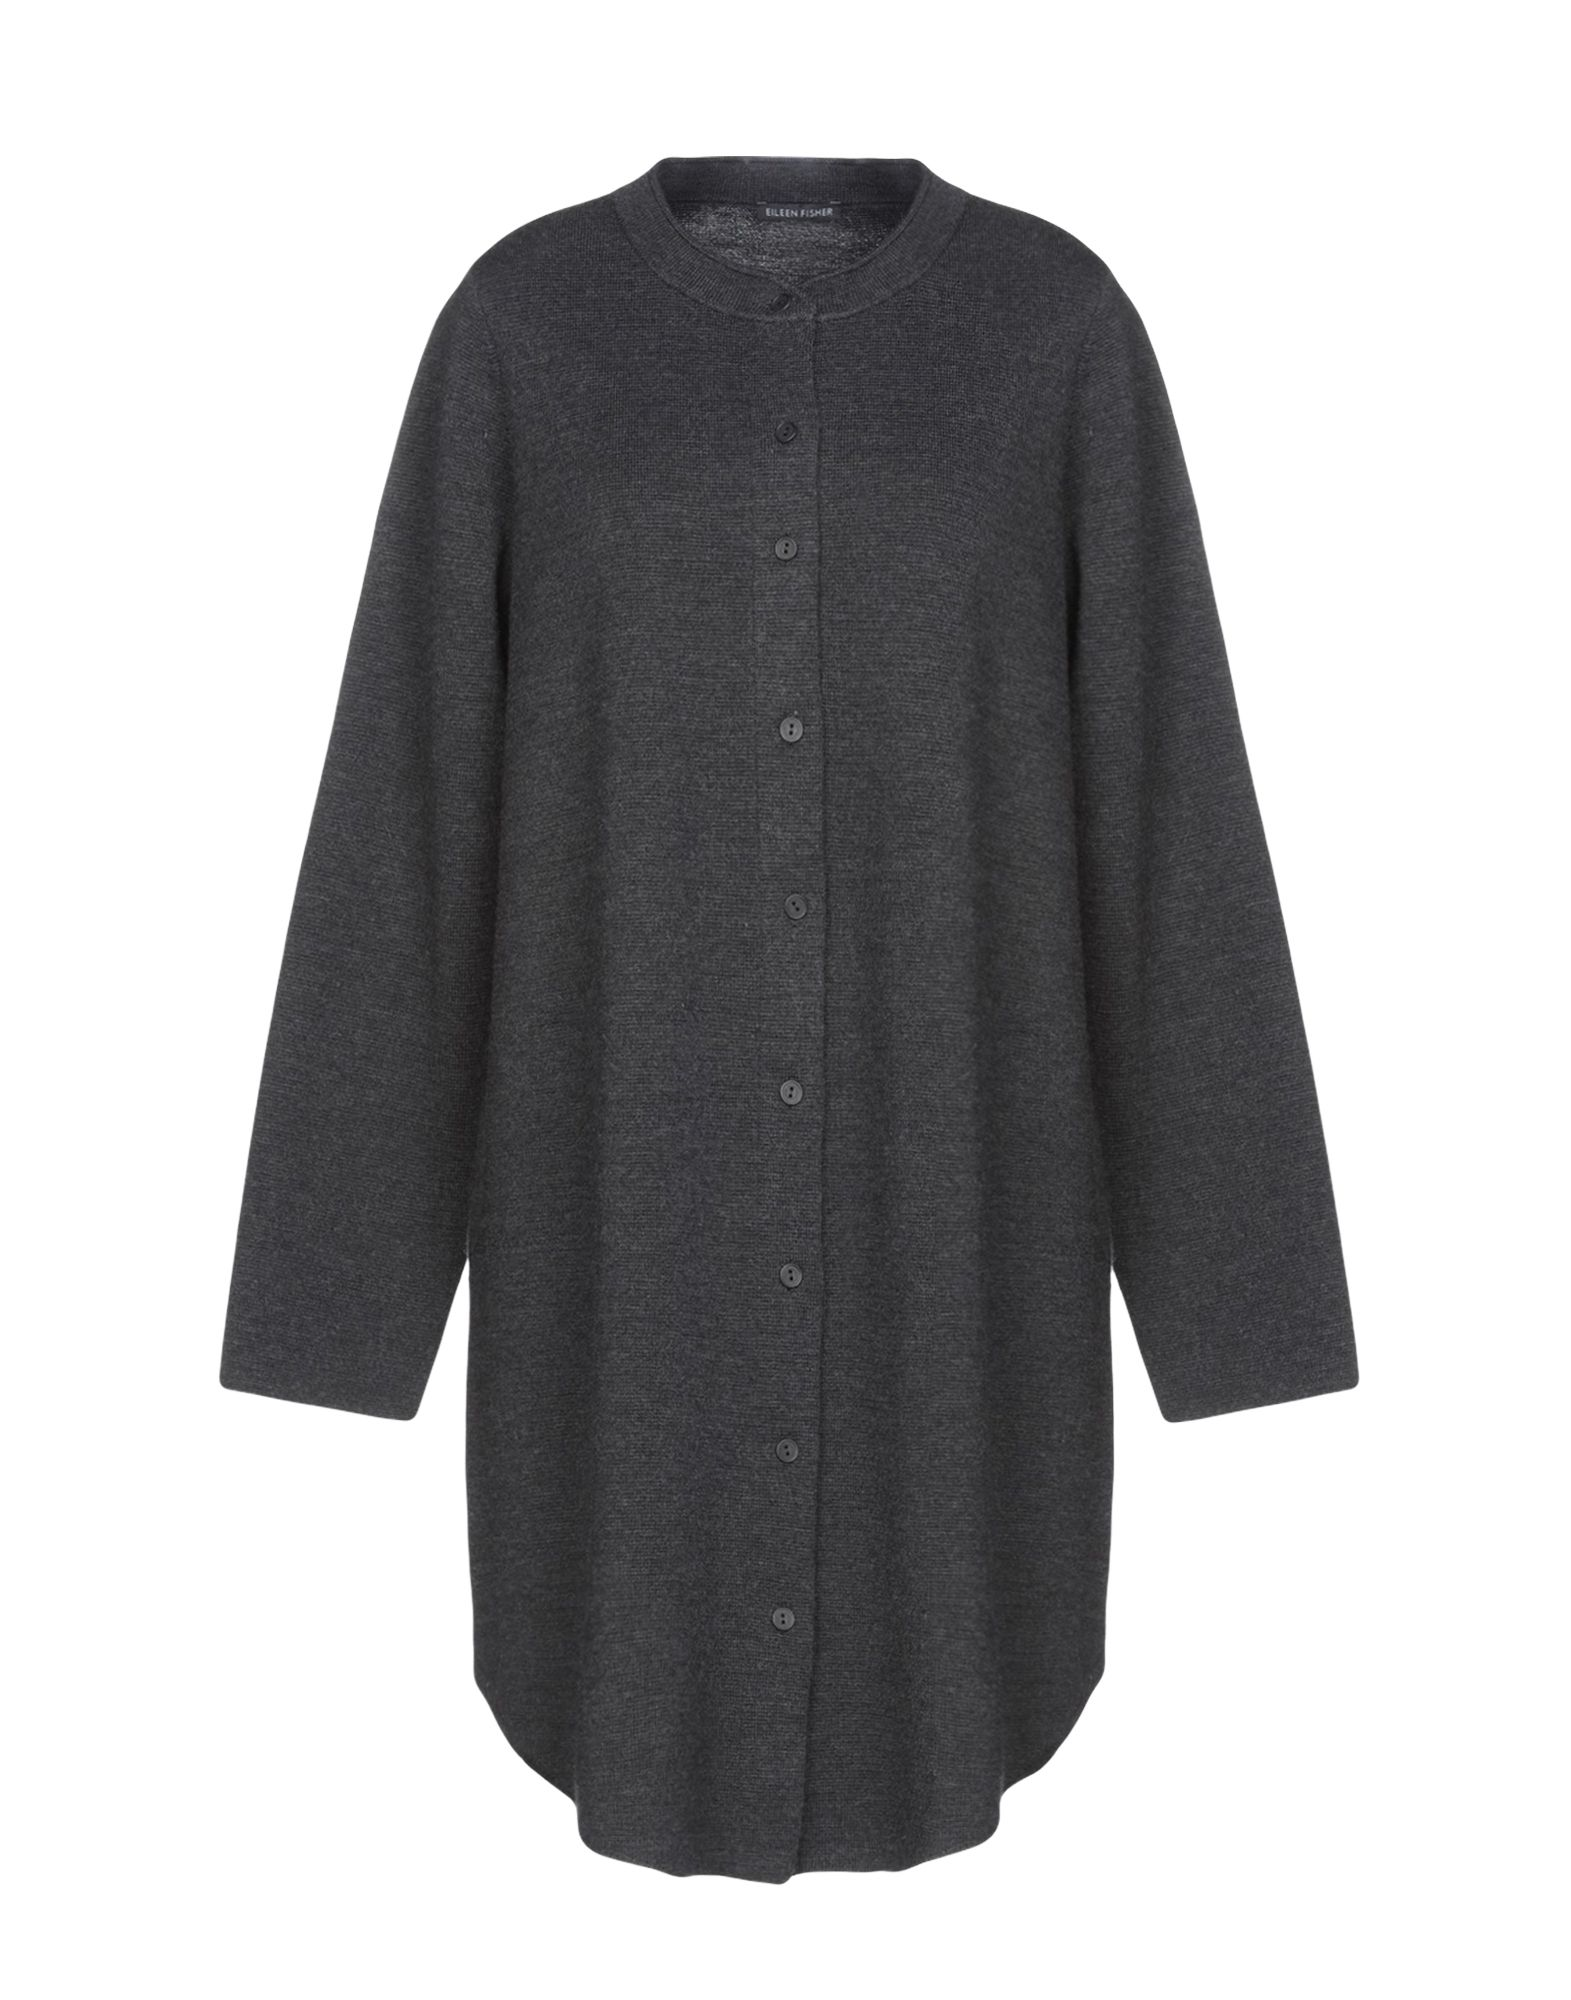 EILEEN FISHER Кардиган eileen fisher new black long sleeve drape top msrp $278 00